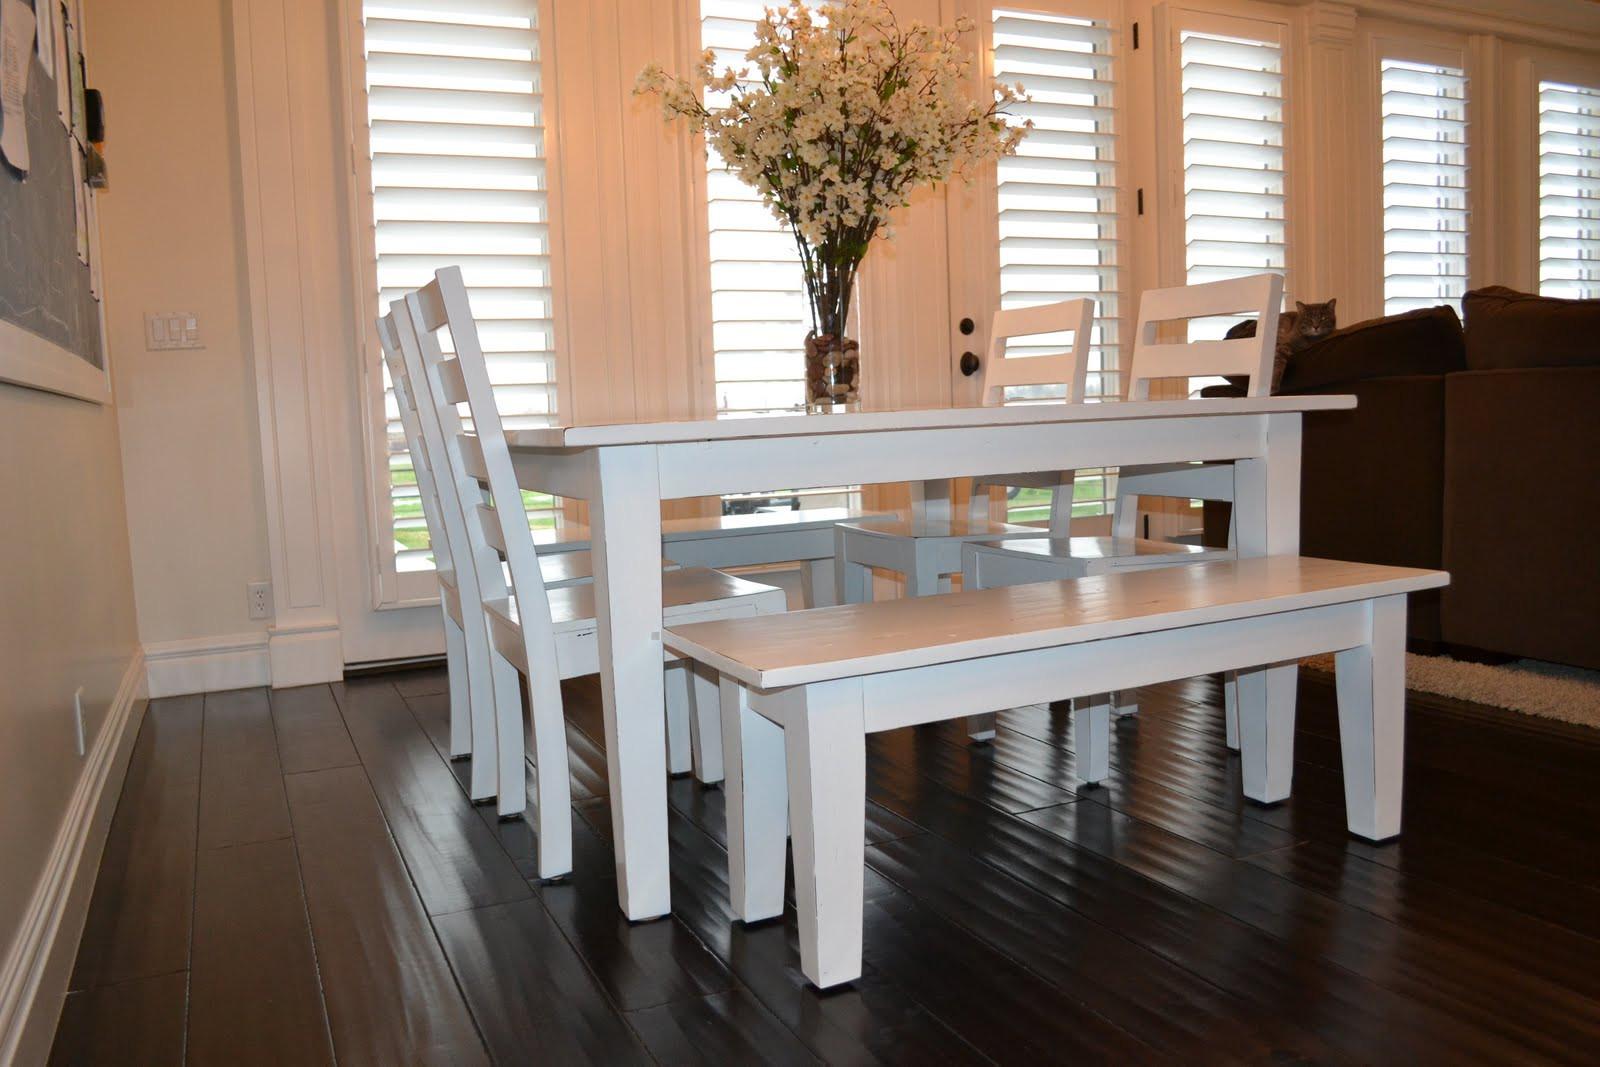 White Kitchen Bench  of Kitchen Design Ideas Remodel and Decor